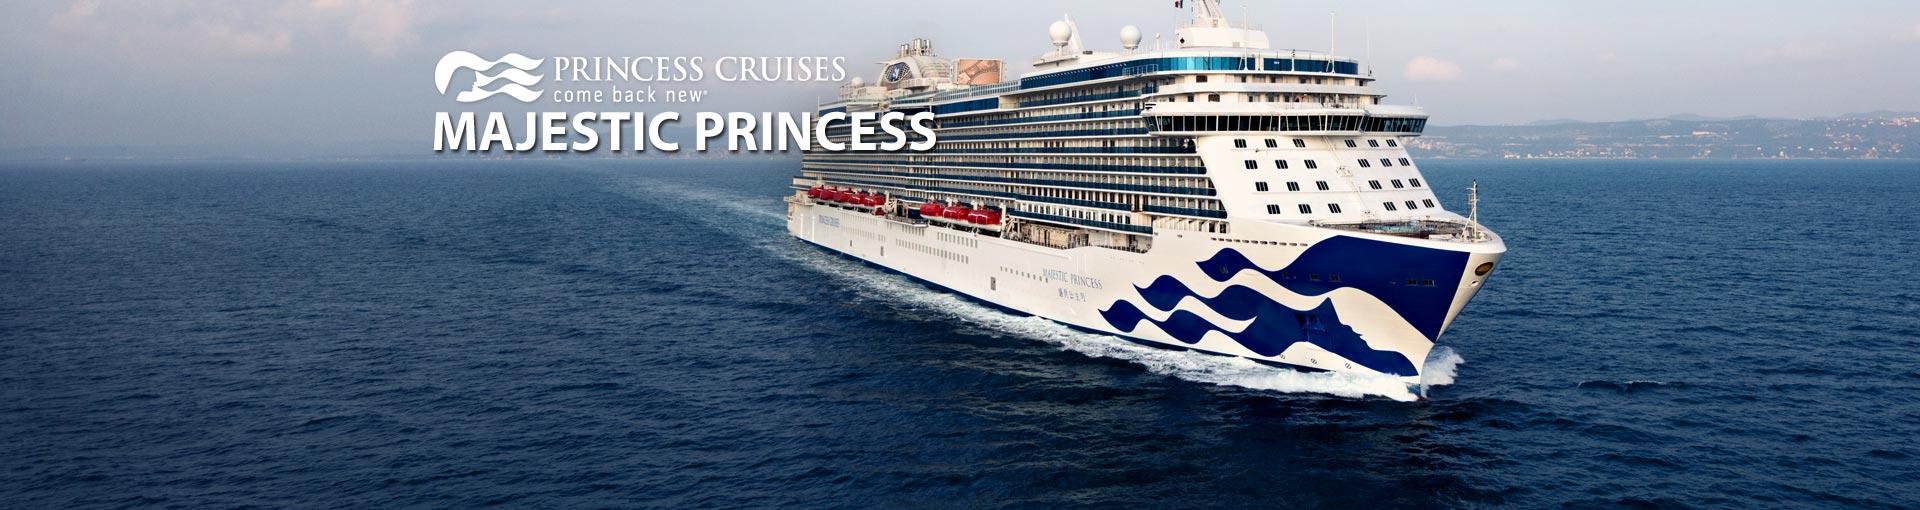 Majestic Princess Cruise Ship 2018 And 2019 Majestic Princess Destinations Deals